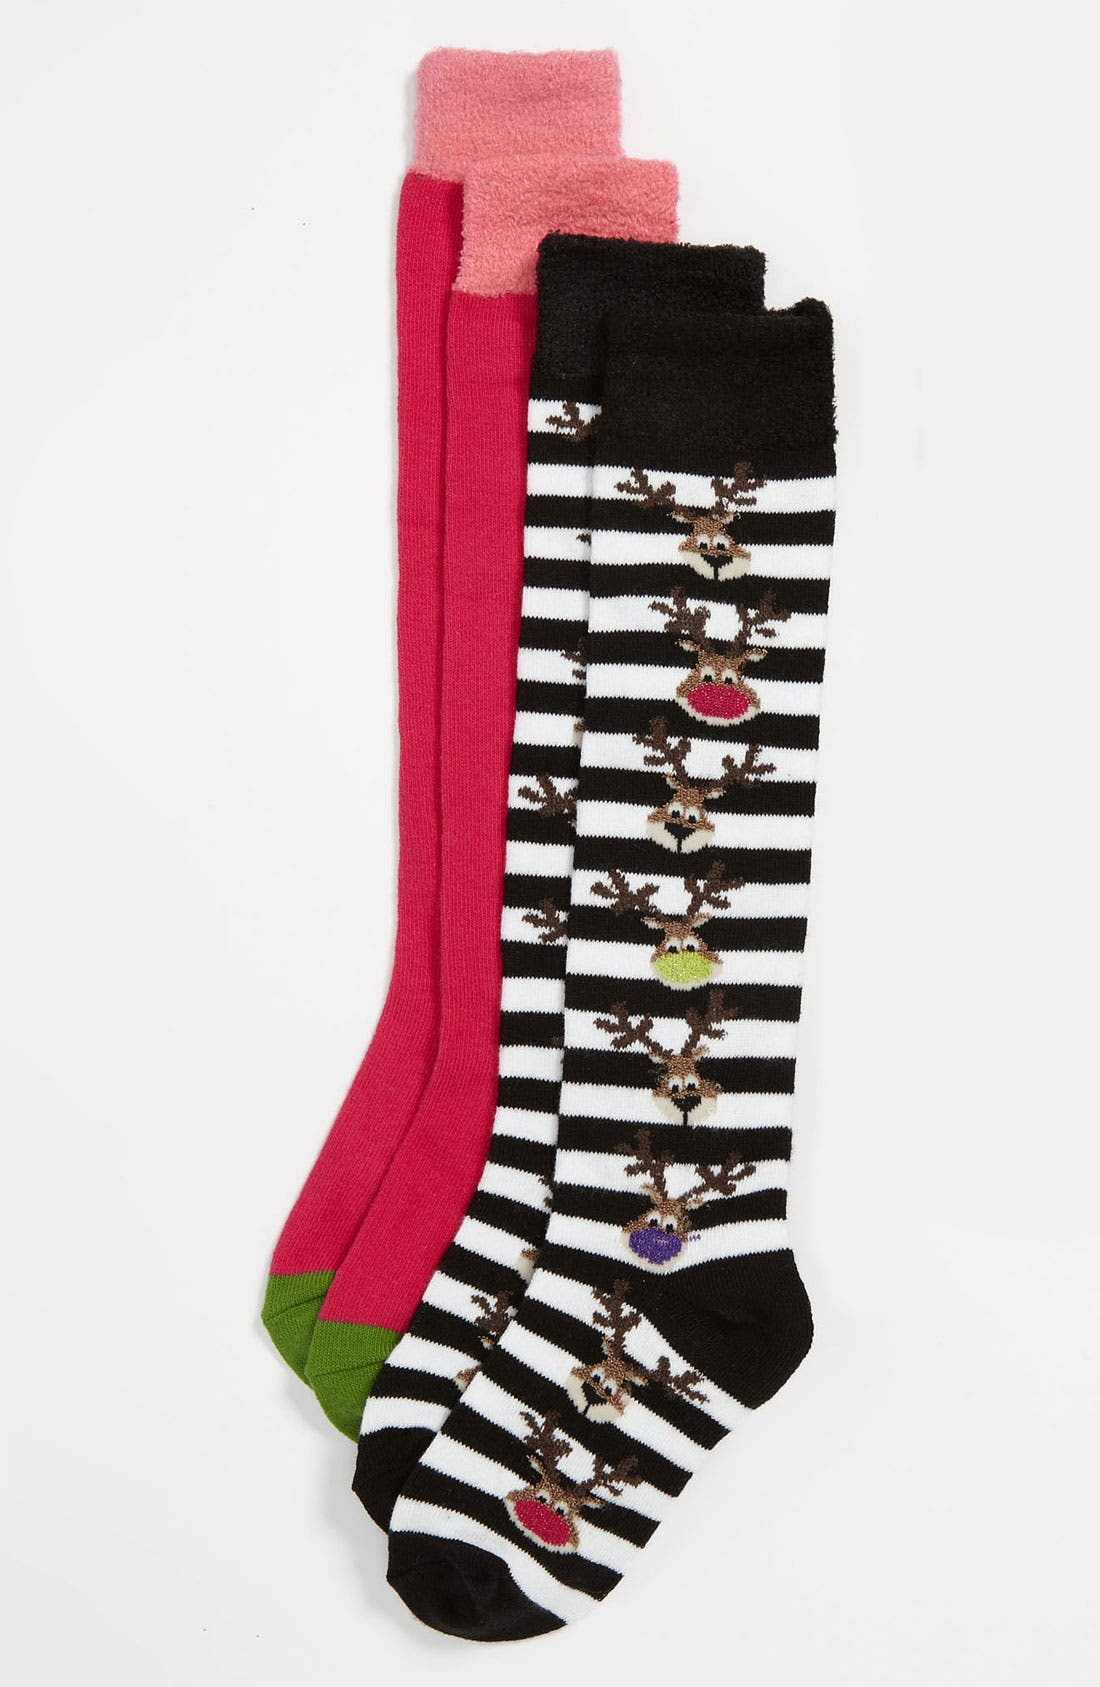 Alternate Image 1 Selected - Nordstrom 'Silly Reindeer' Knee High Socks (2-Pack) (Walker, Toddler, Little Kid & Big Kid)